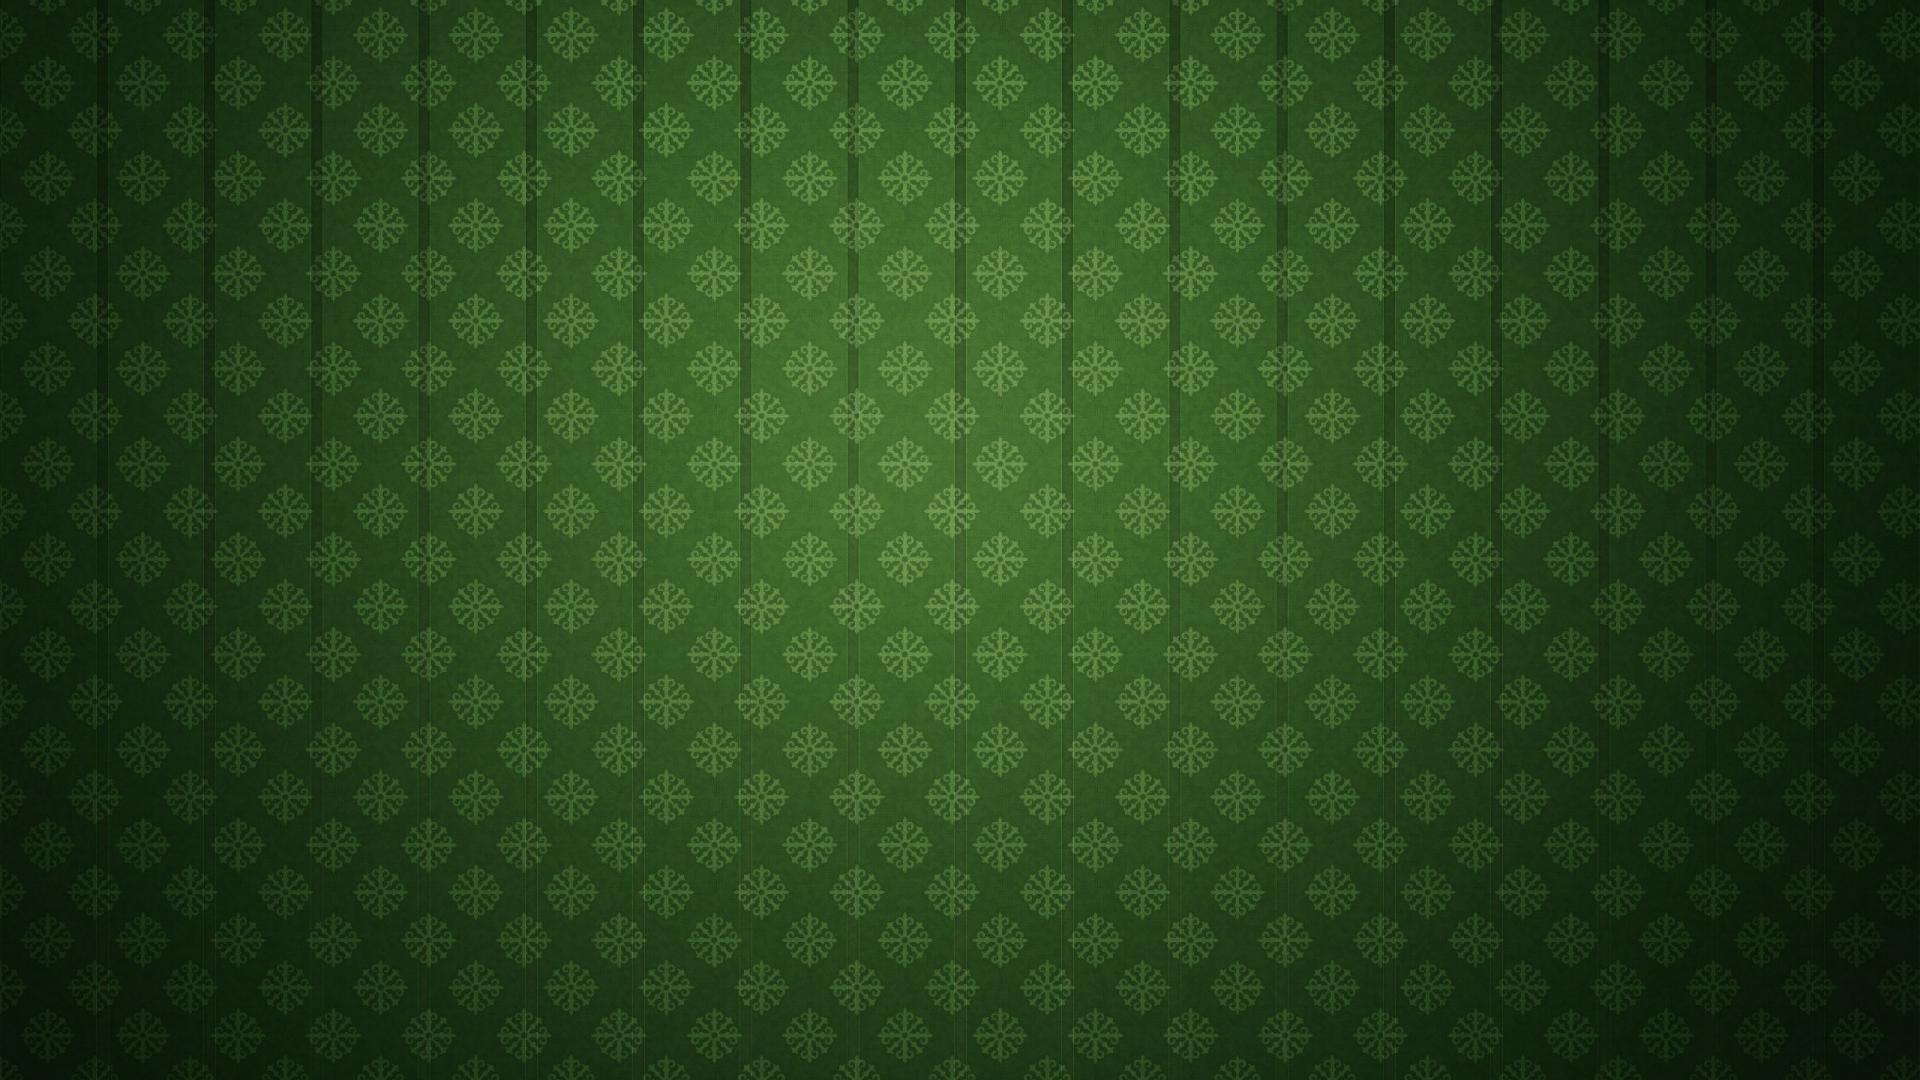 Cool Green stripes hd desktop backgrounds wide wallpapers:1280×800,1440×900,1680×1050  –